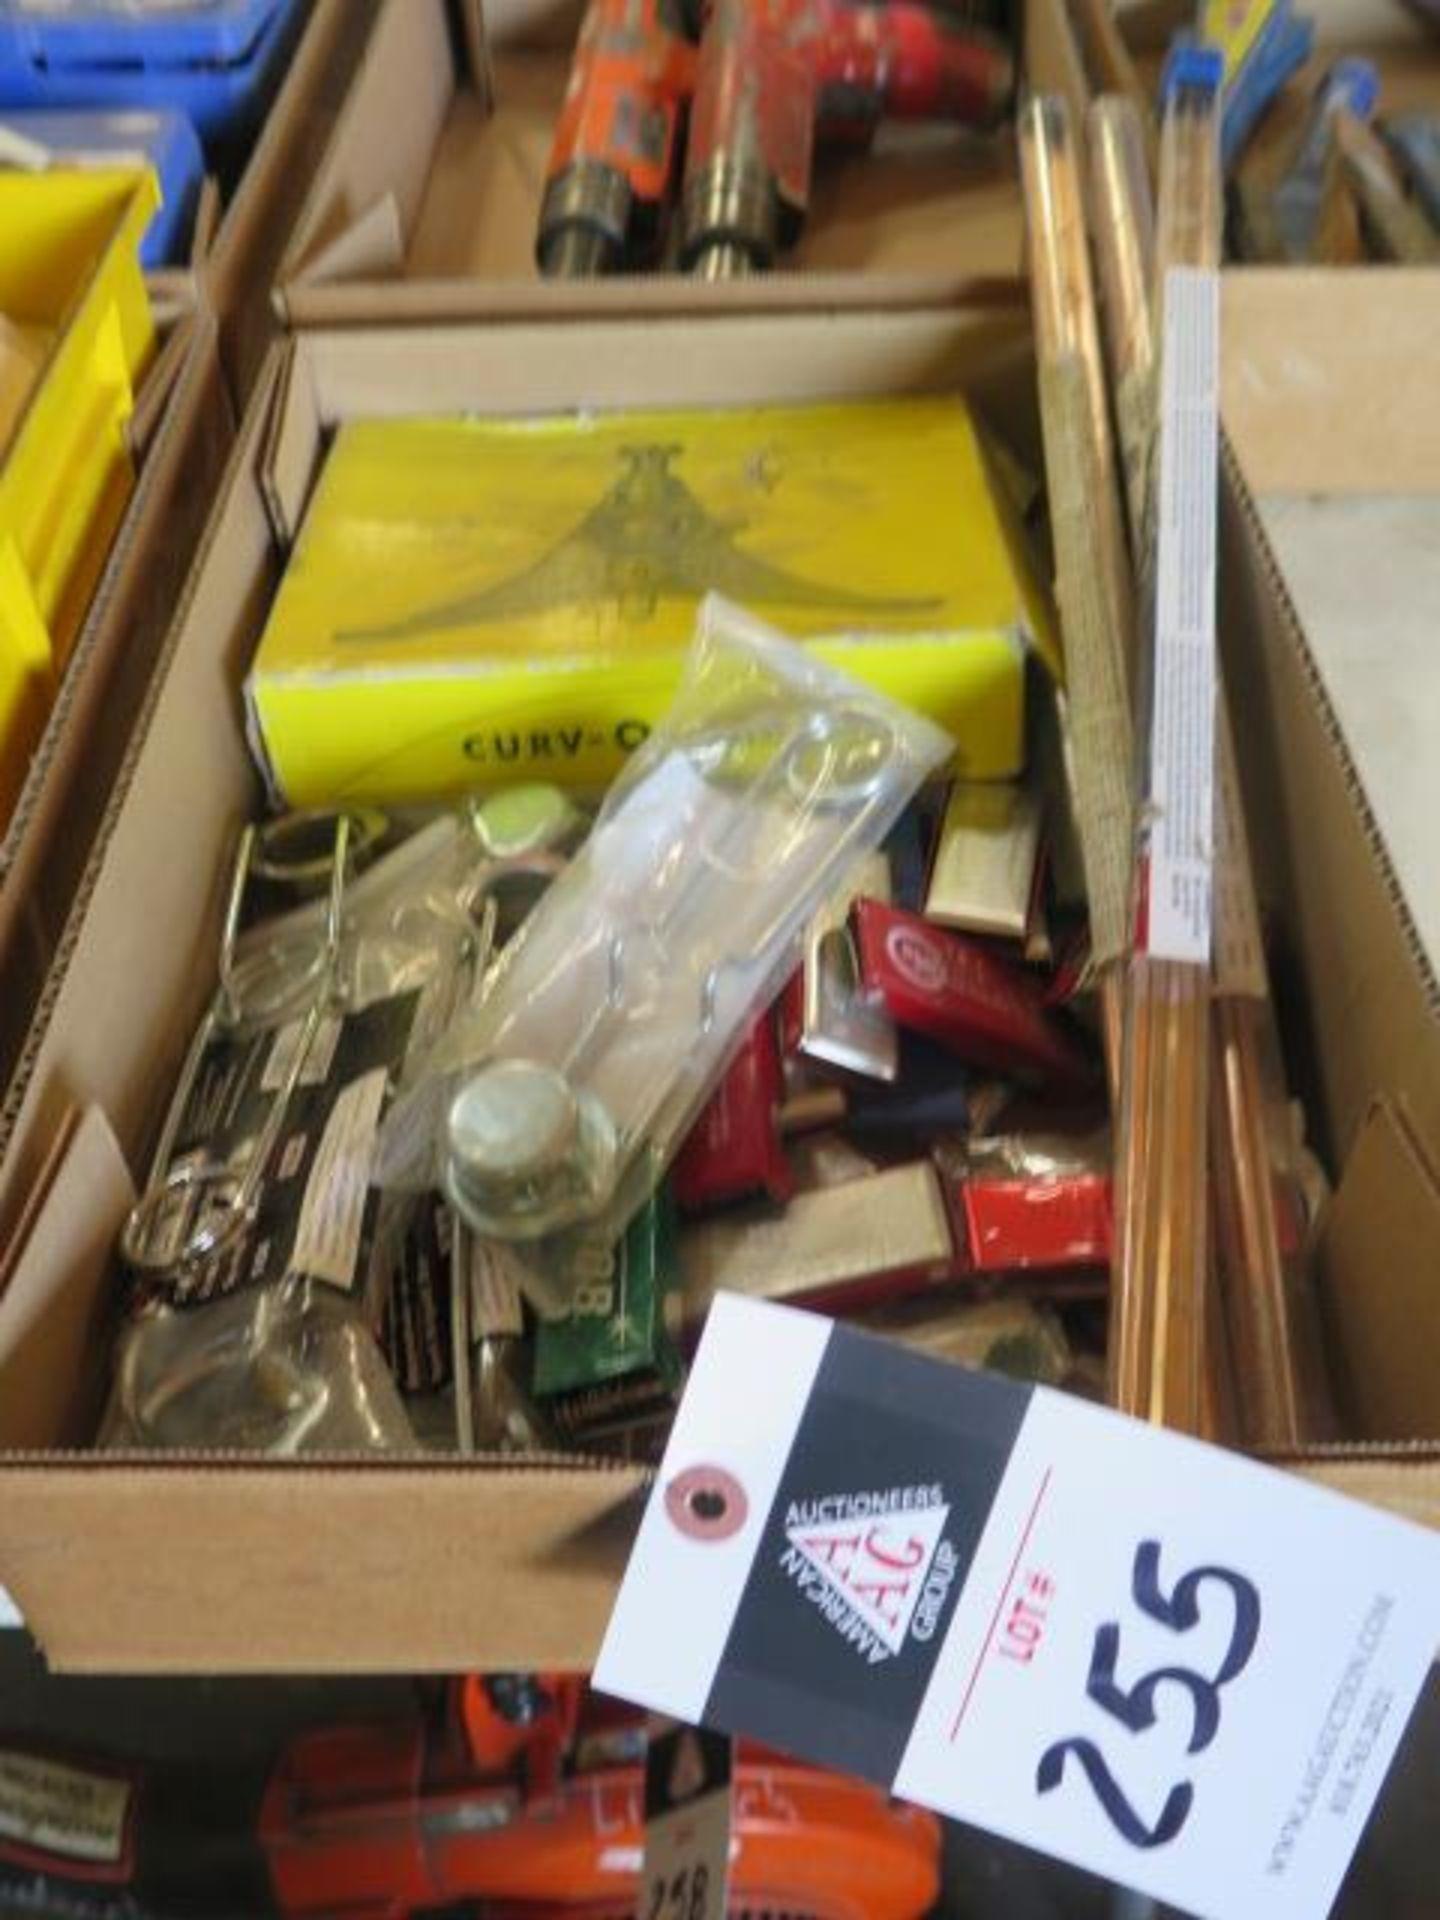 Misc Welding Supplies (SOLD AS-IS - NO WARRANTY)